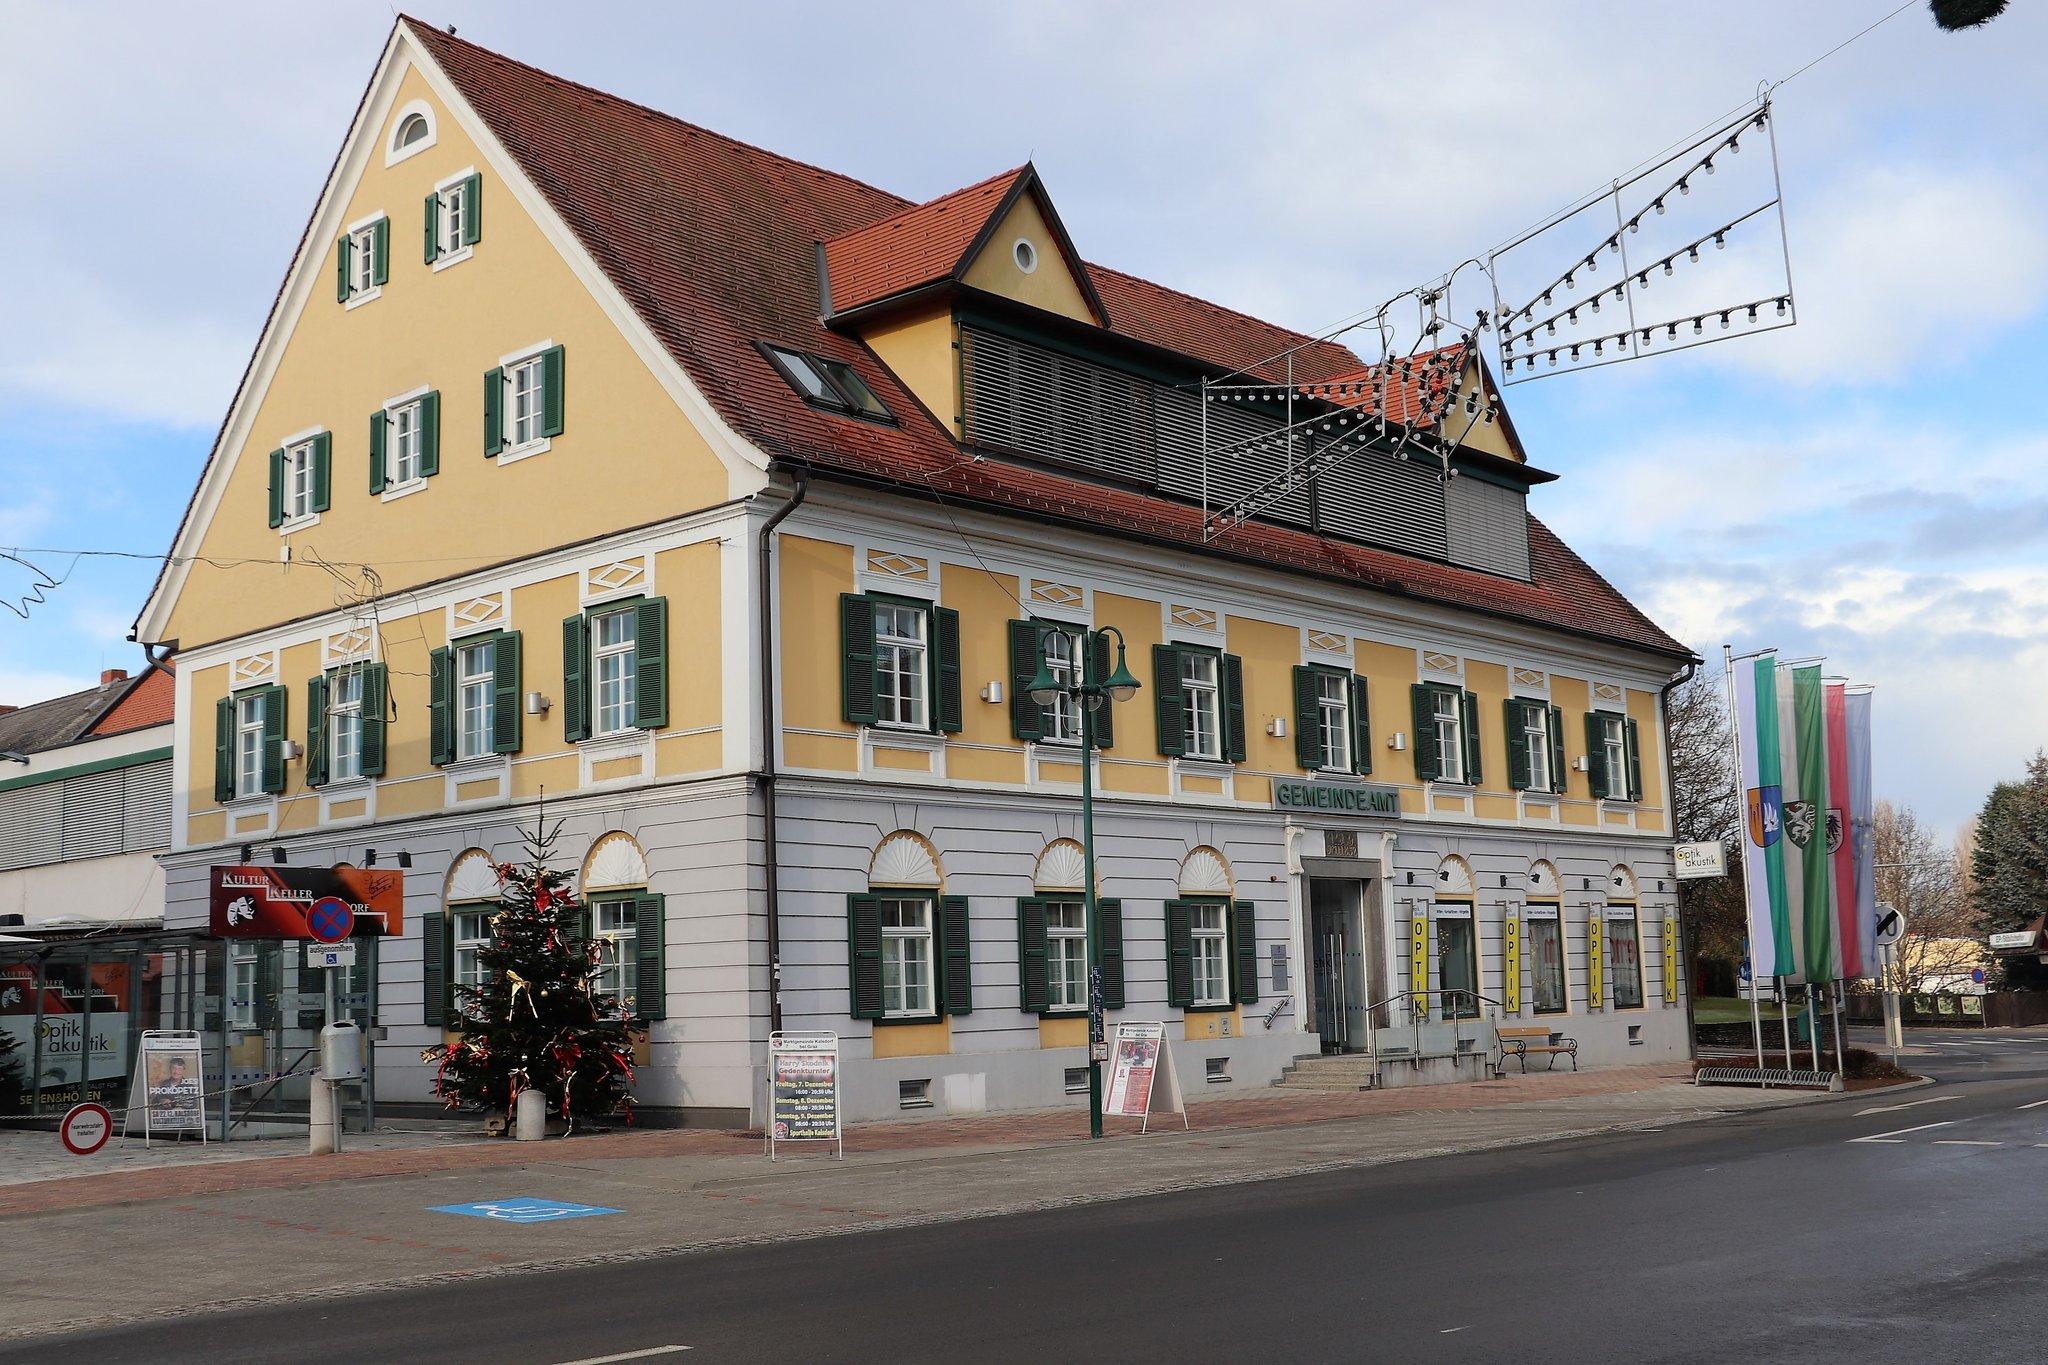 Bekanntschaften in Kalsdorf bei Graz - Partnersuche